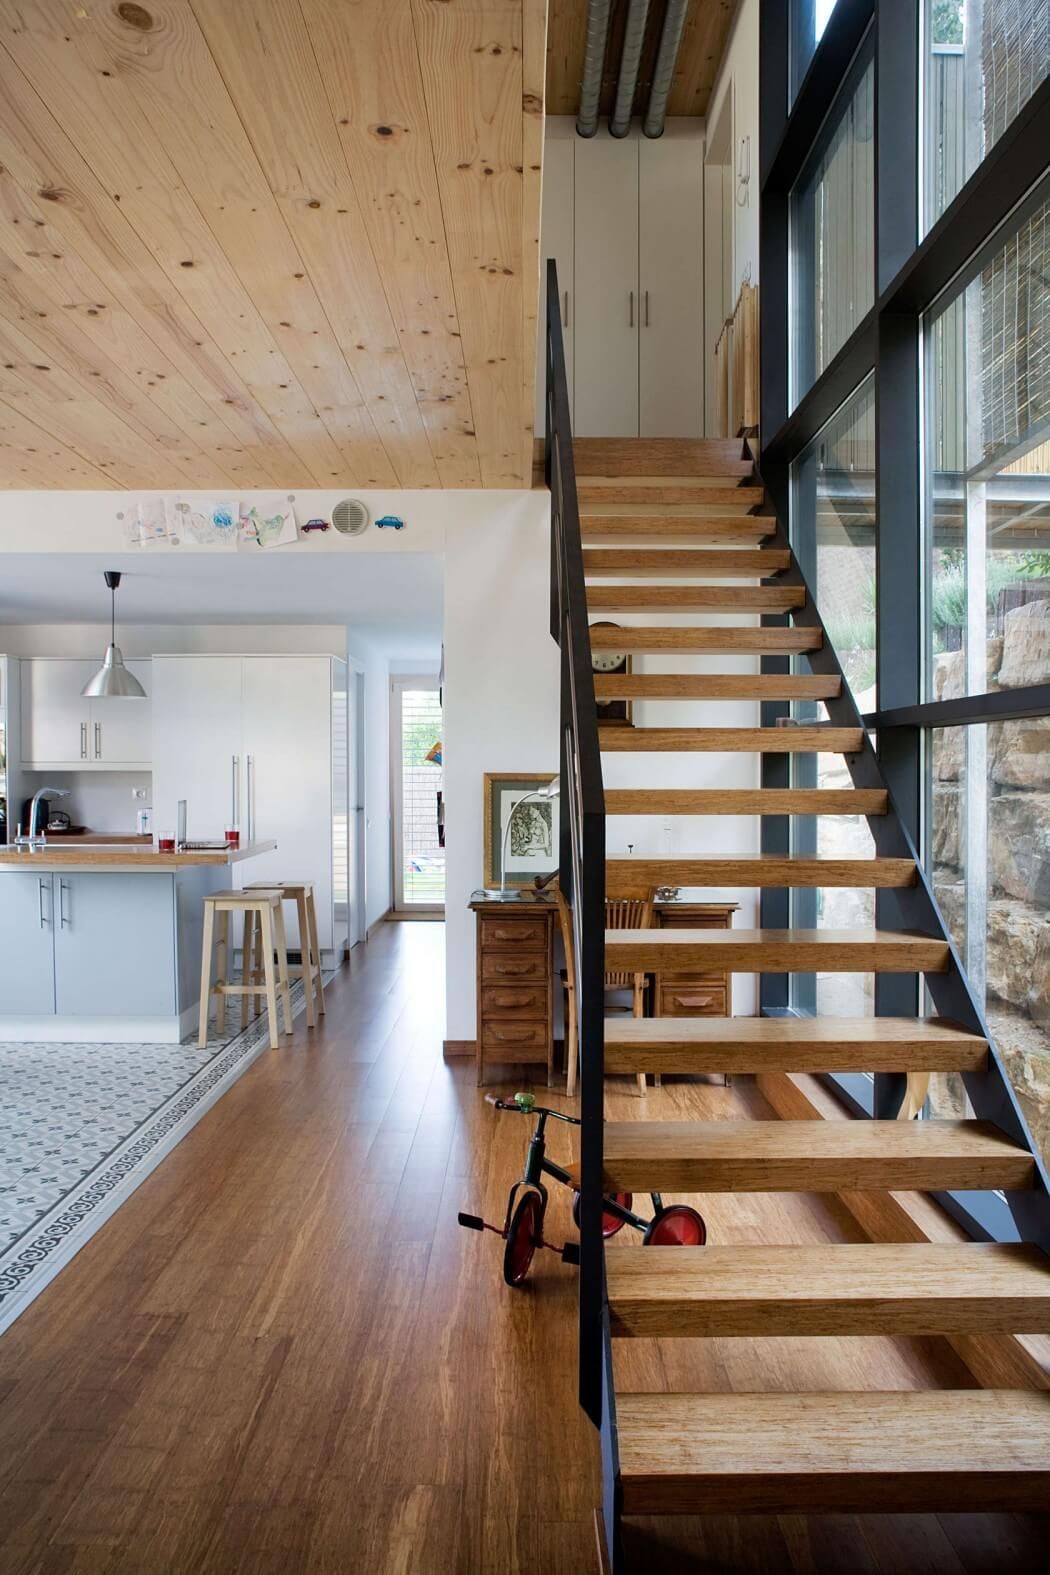 Casa sauc by noem house pinterest for Casas pequenas modernas interiores